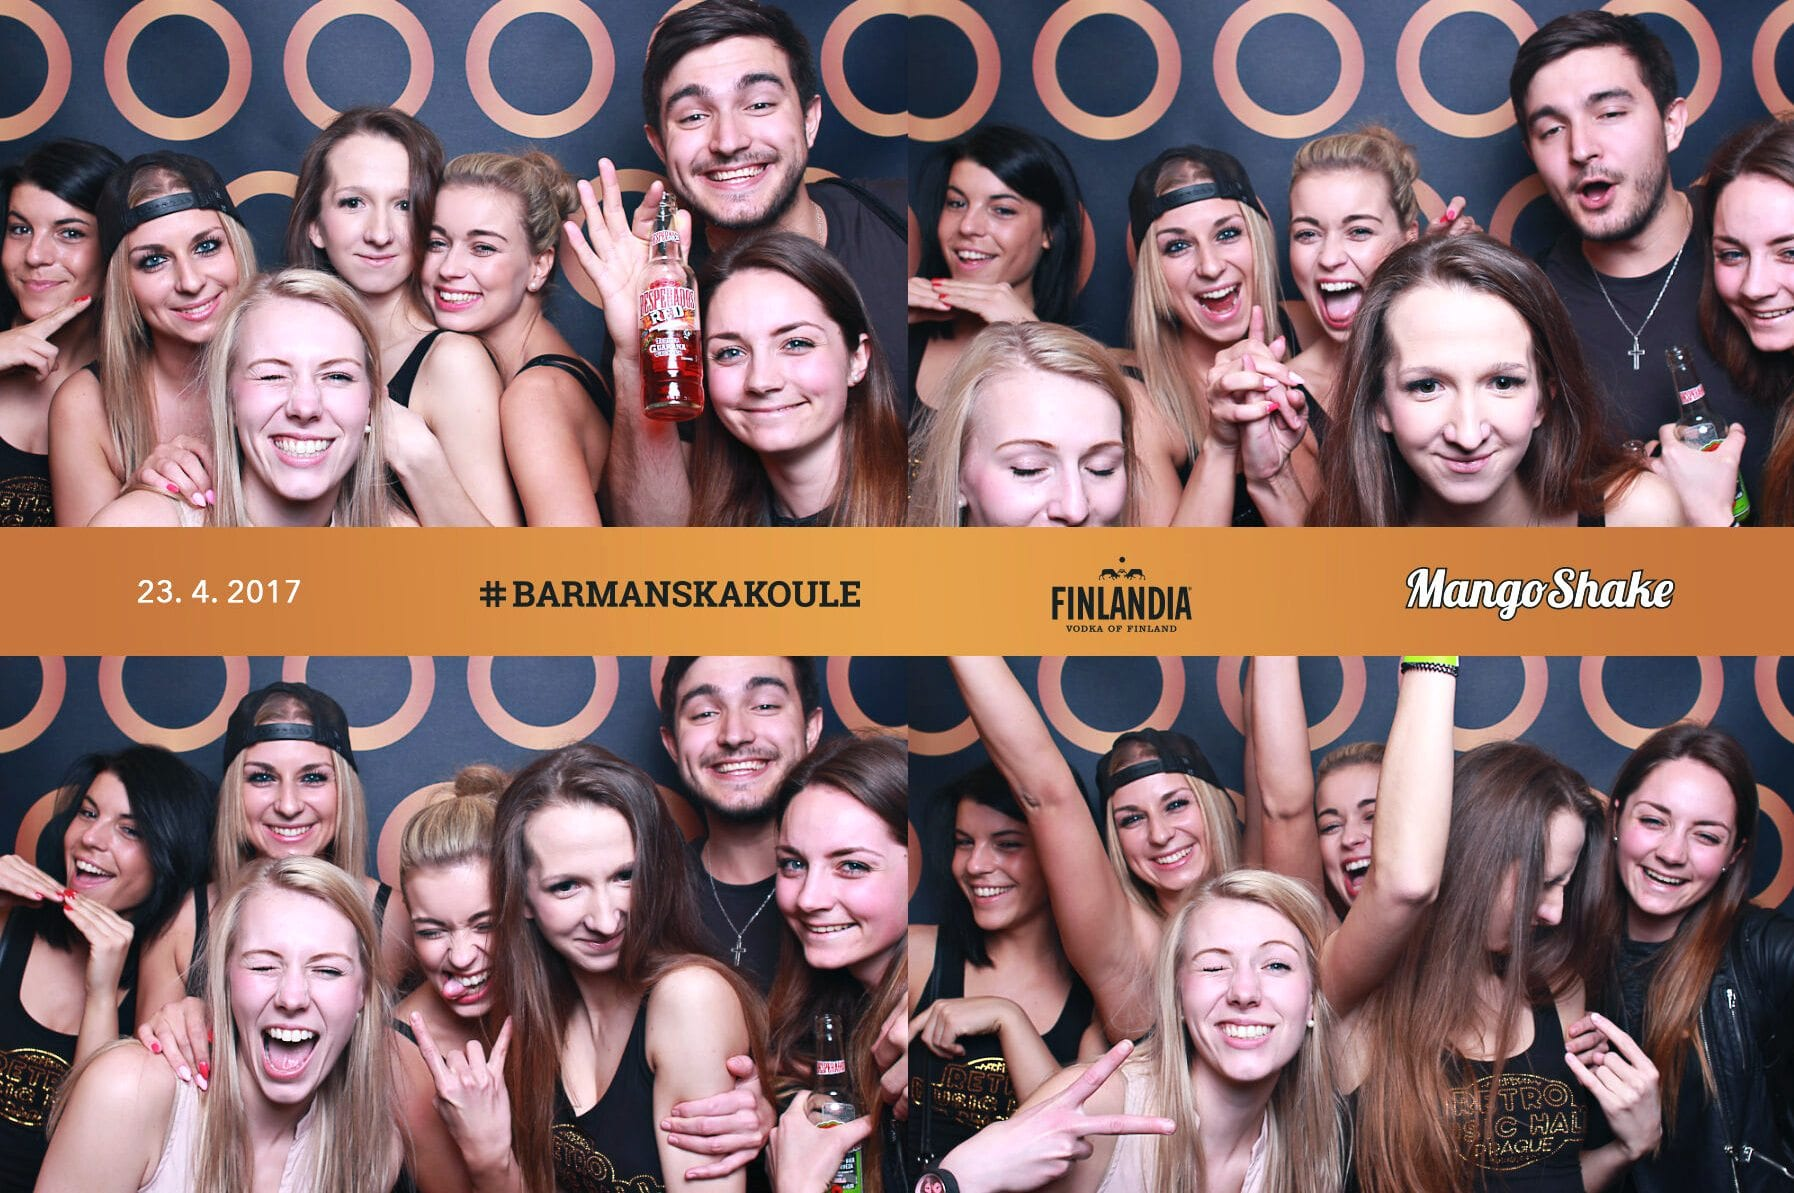 fotokoutek-coolhunters-barmanska-koule-23-4-2017-237092